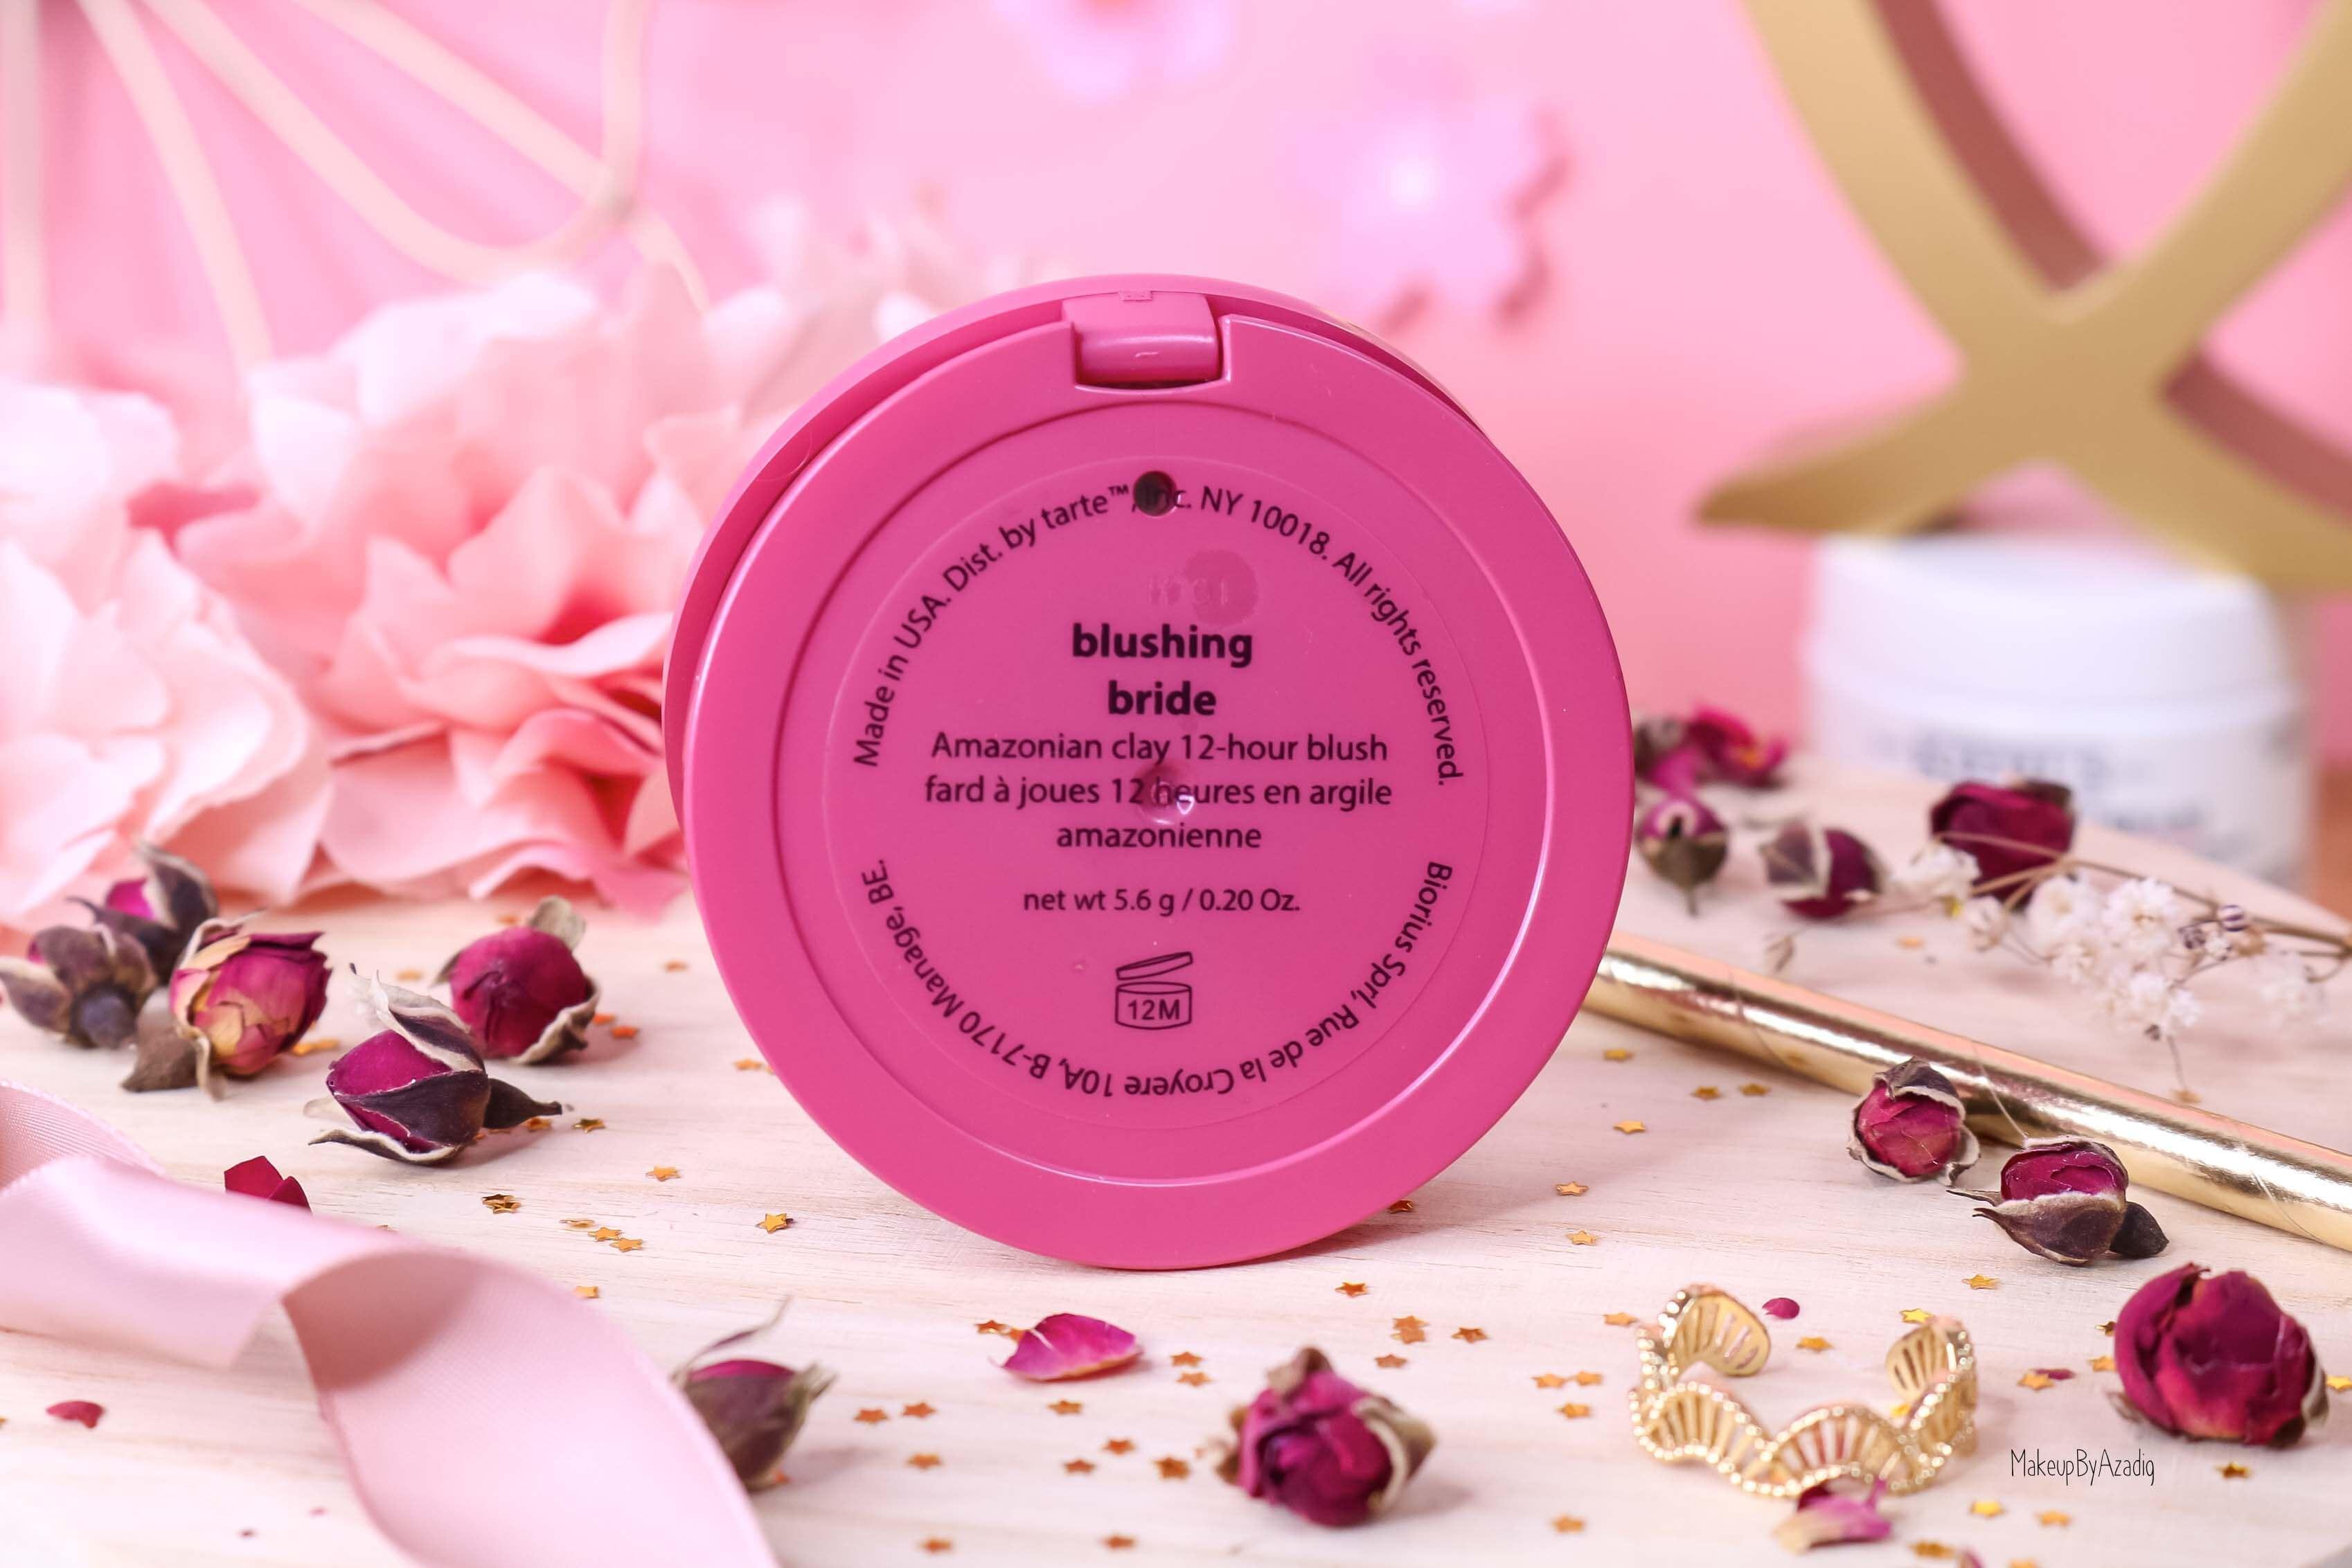 revue-blush-amazonian-clay-tarte-cosmetics-makeupbyazadig-sephora-france-blushing-bride-swatch-avis-prix-dos